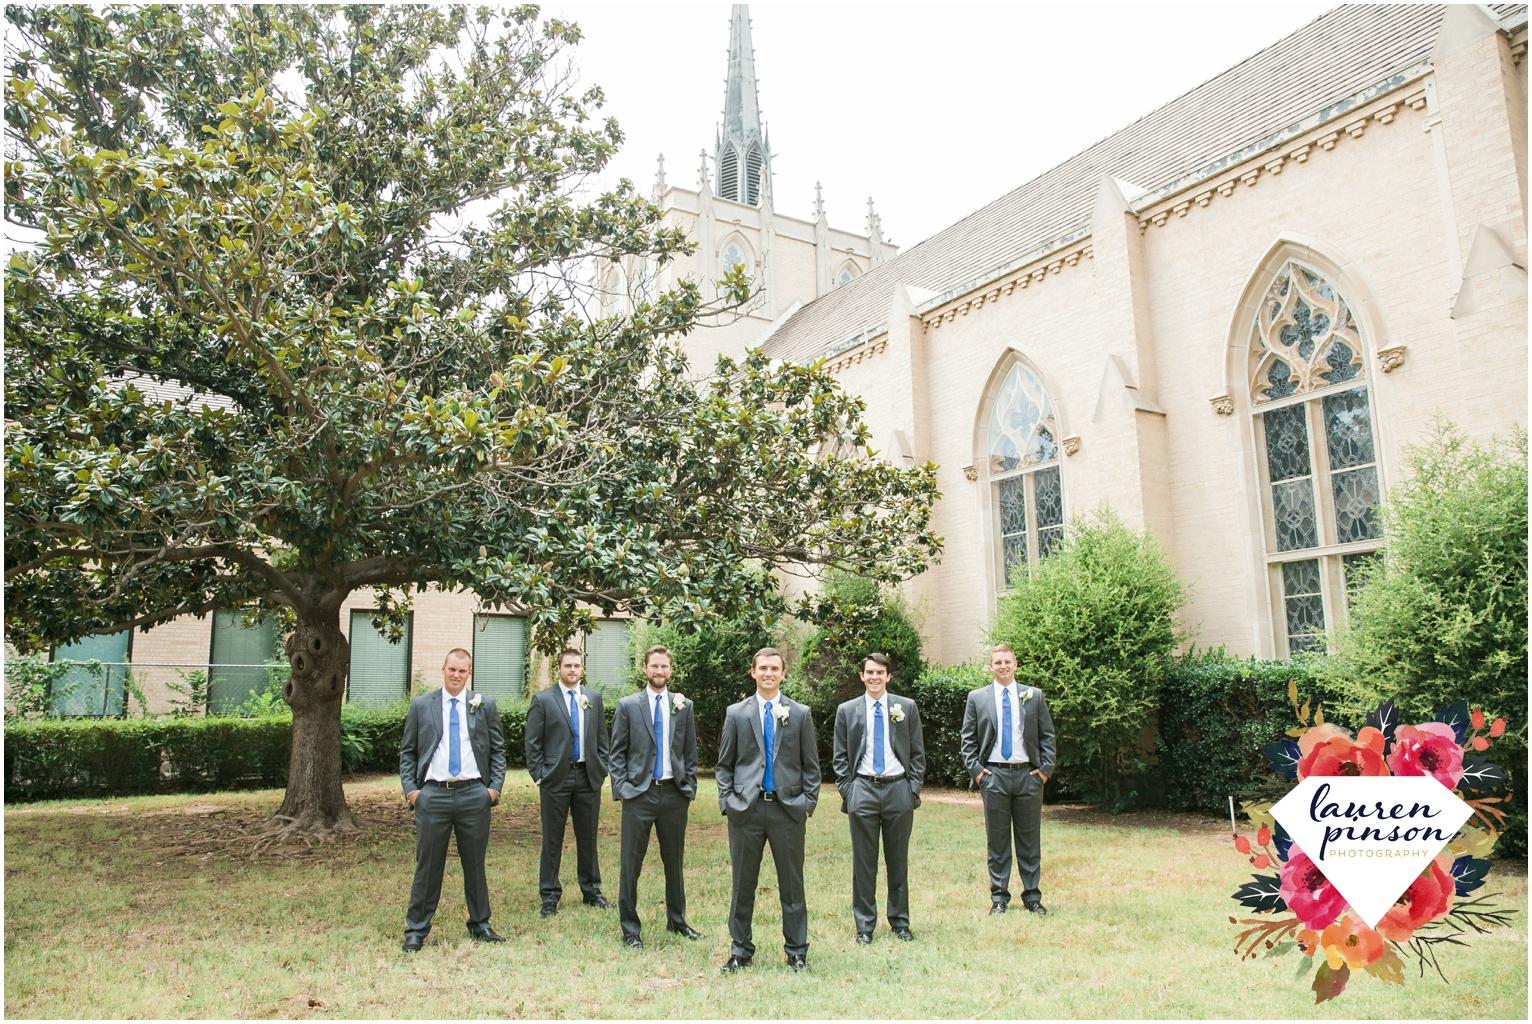 wichita-falls-wedding-photography-at-fain-presbyterian-church-and-the-wellington-timeless-classic-modern-photographer_1151.jpg